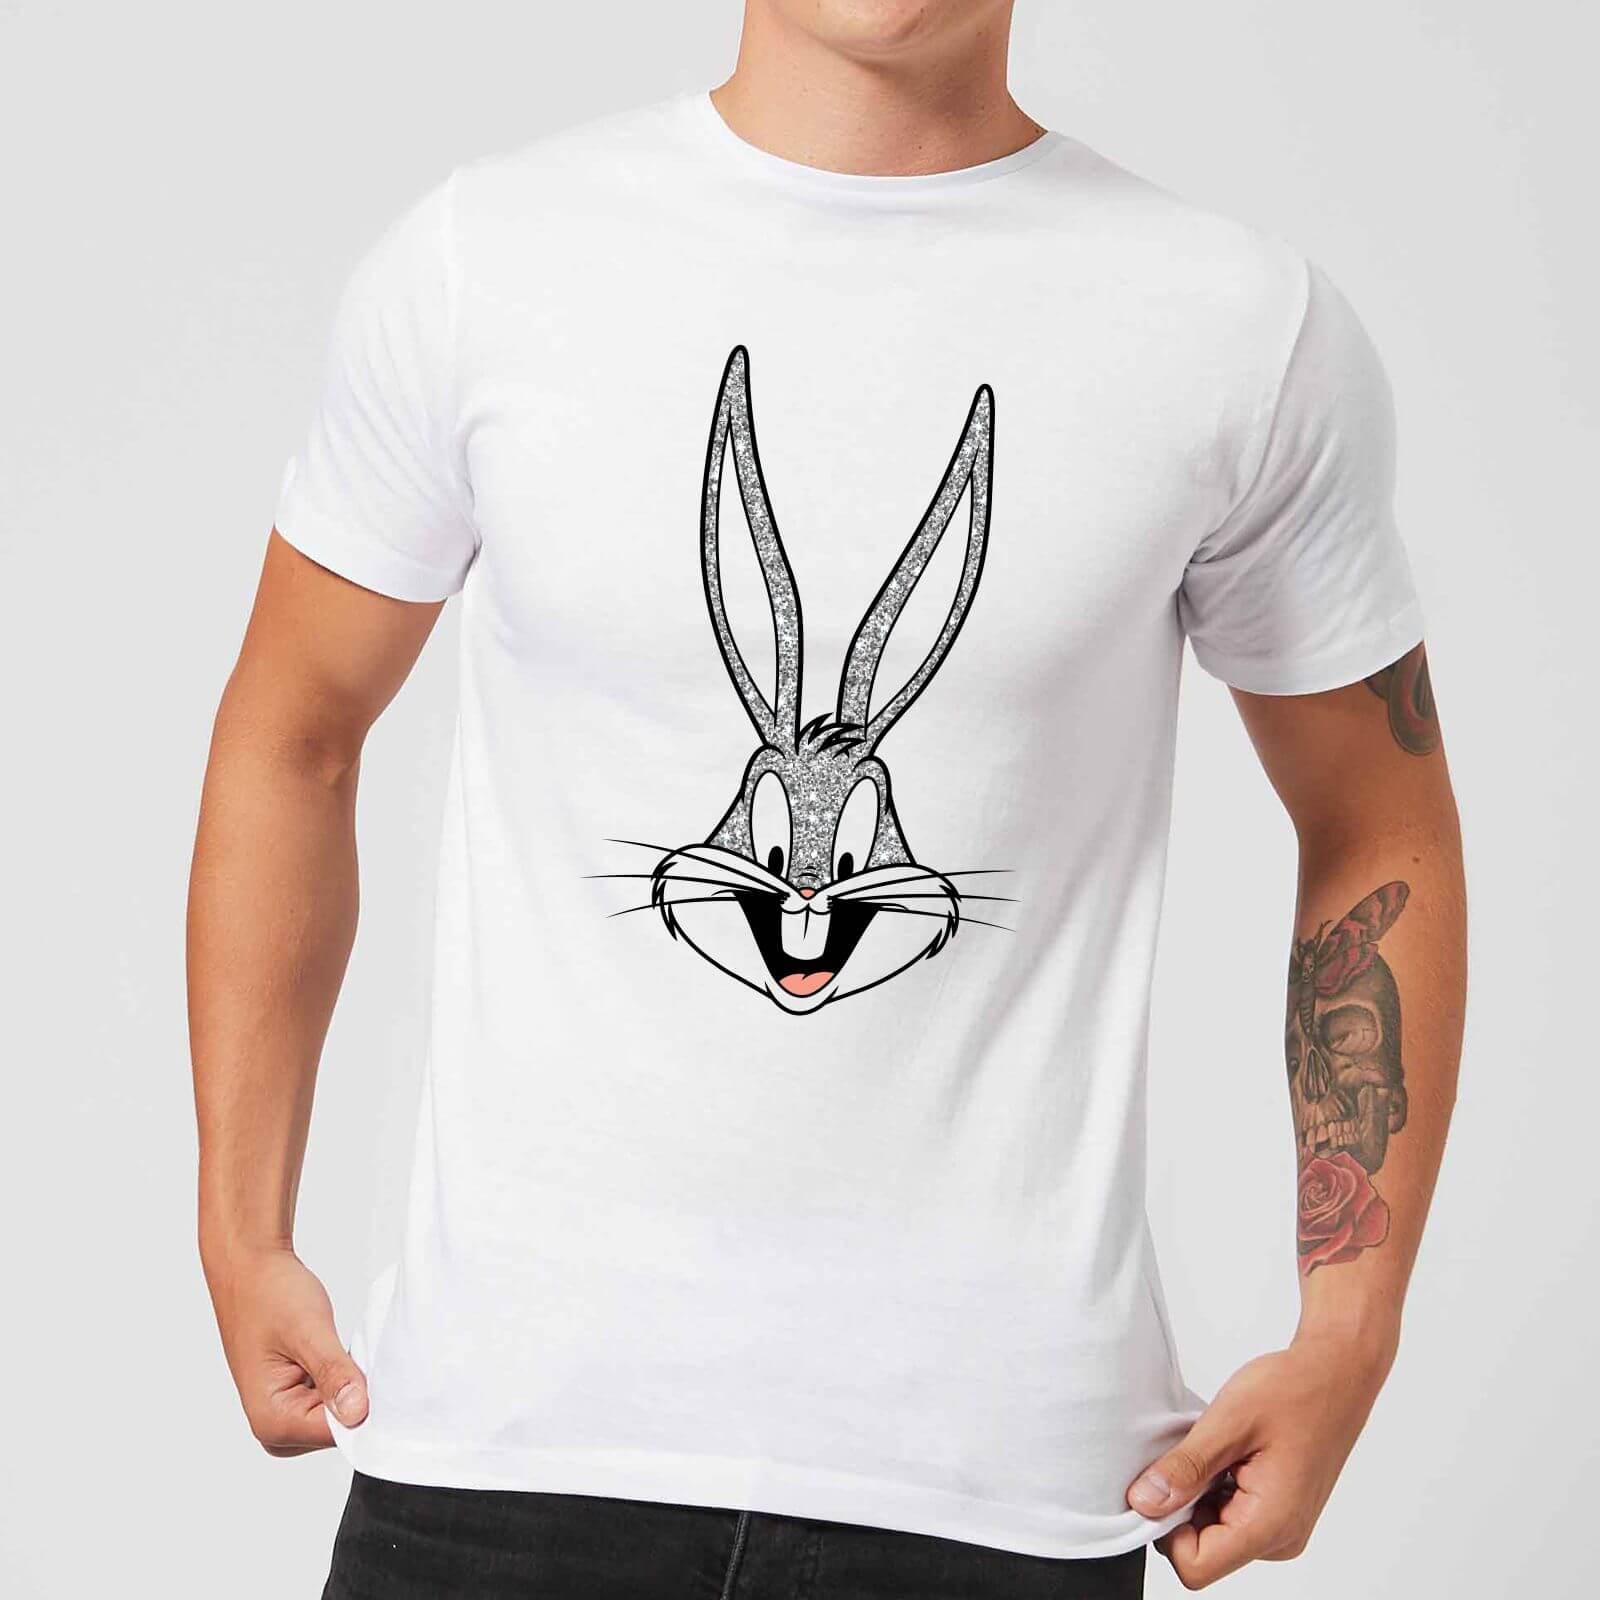 afa82d297ff Looney Tunes Bugs Bunny Men's T-Shirt - White Clothing | Zavvi